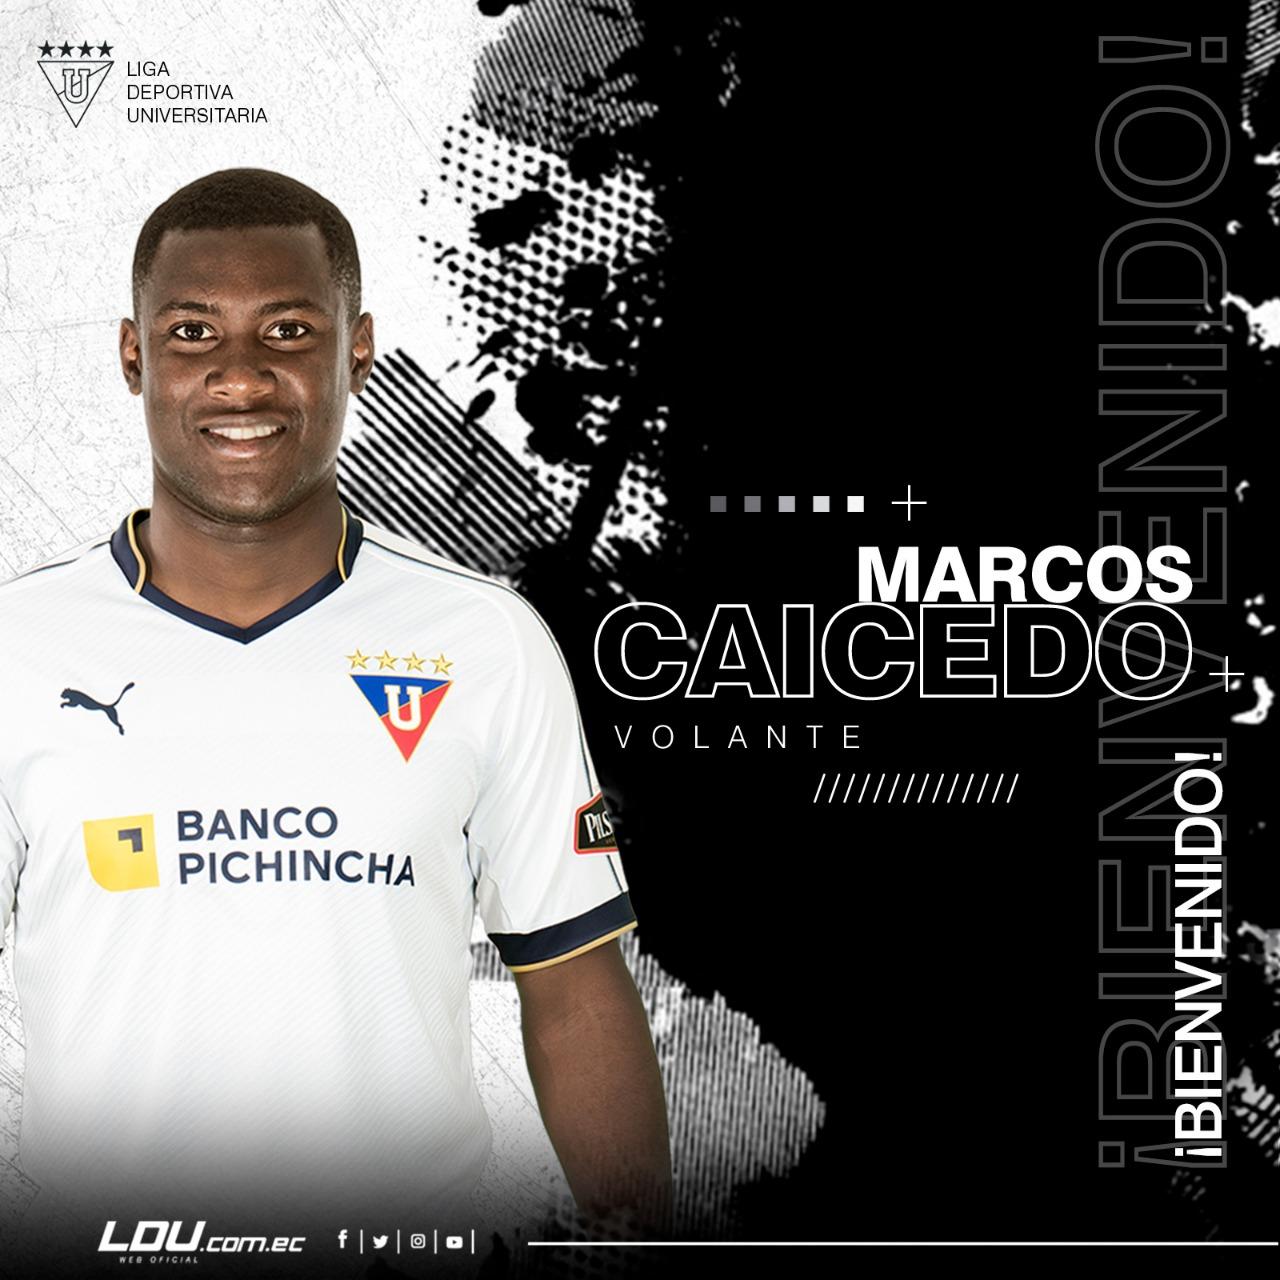 Photo of OFICIAL: Marcos Caicedo jugará en LDUQ por tres temporadas